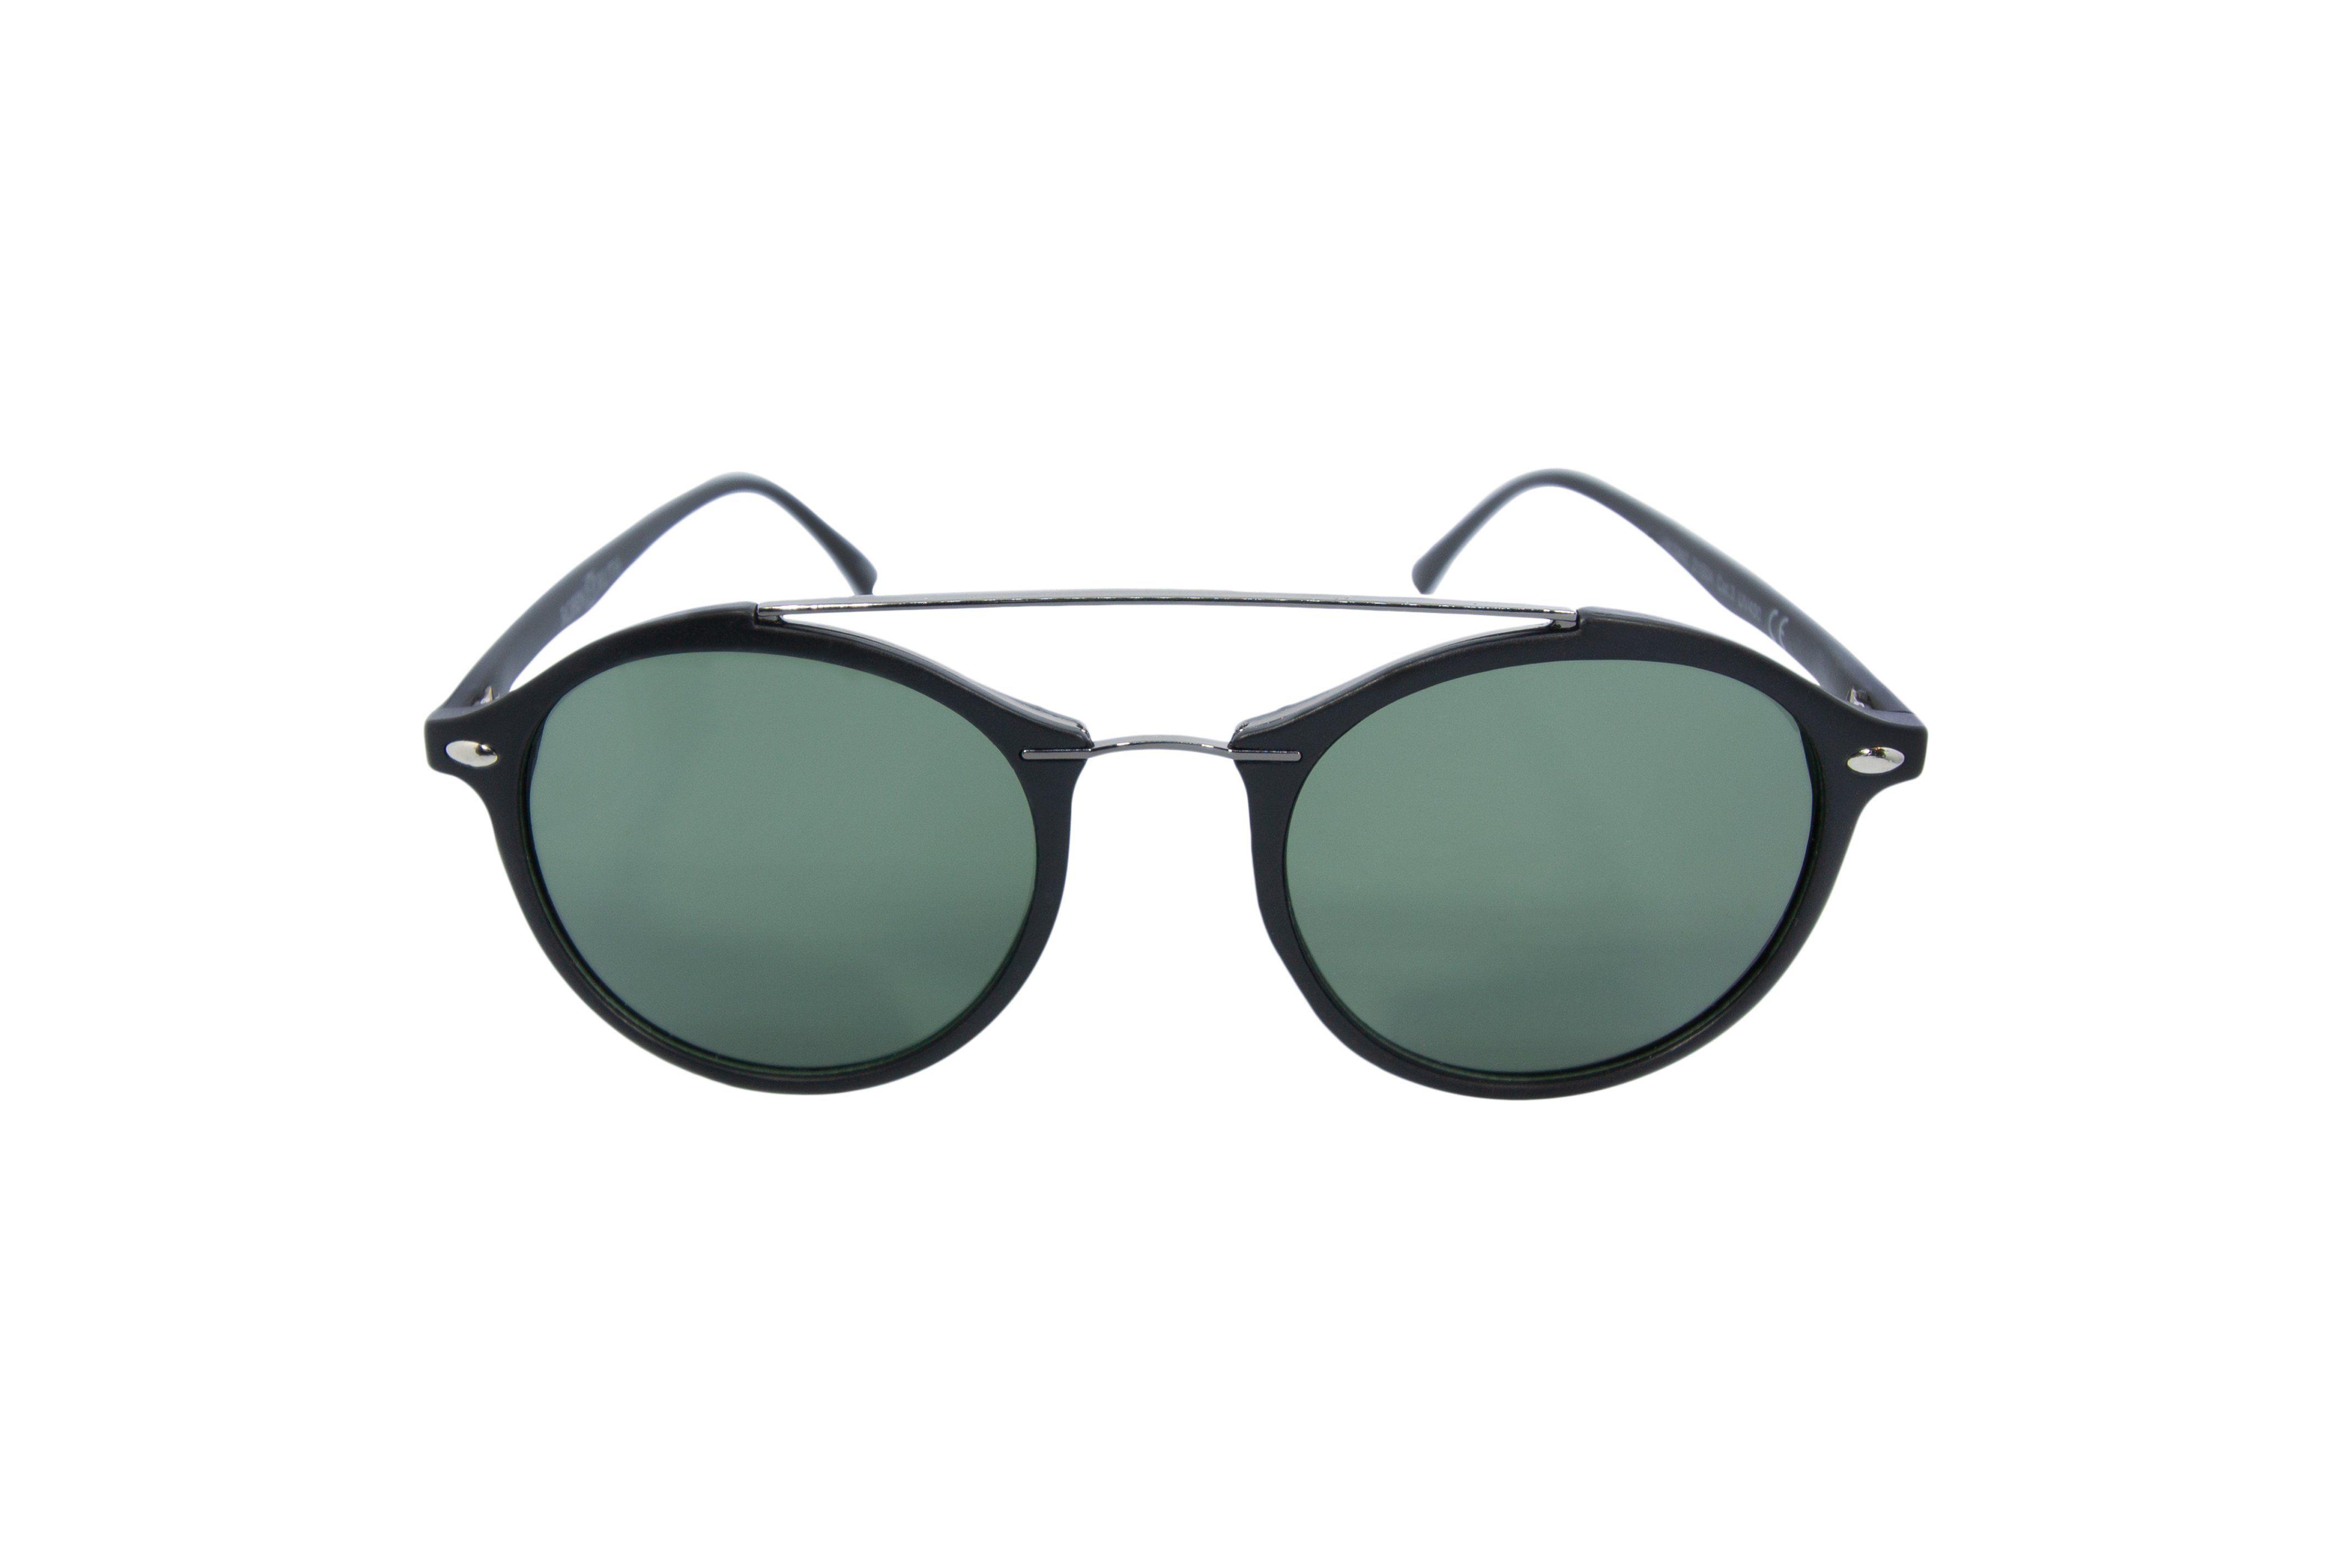 666db0cd32c Robin Ruth  Omaha  Sunglasses